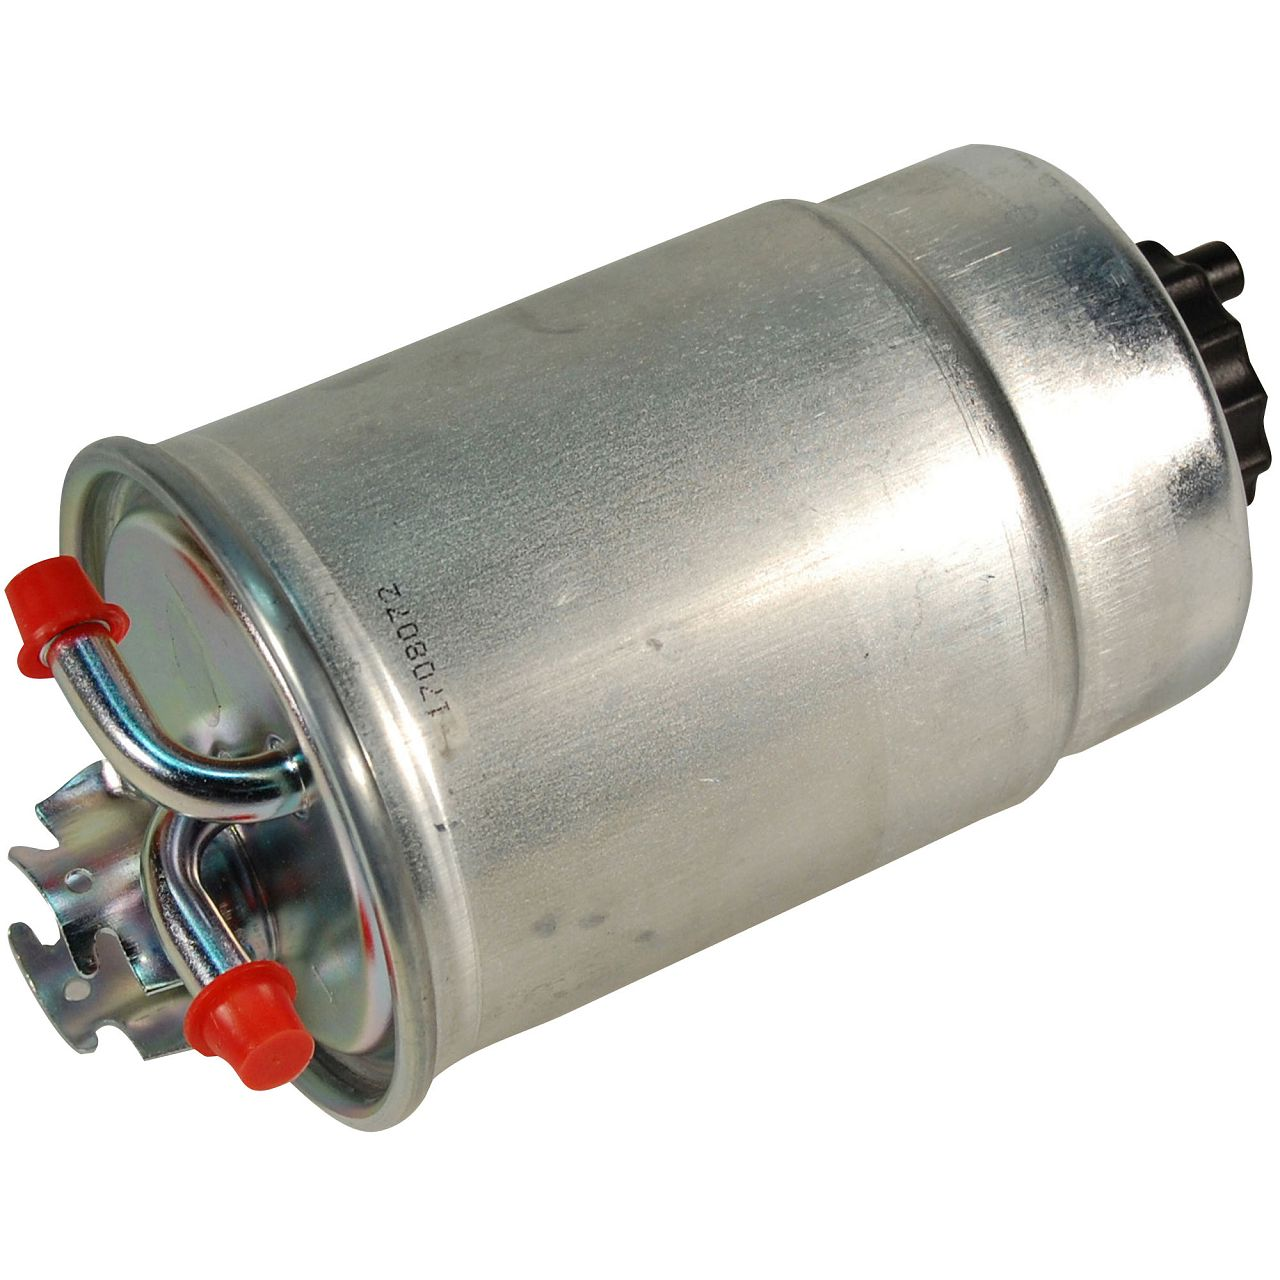 Inspektionskit Filterpaket Filterset für VW TRANSPORTER T4 2.4D 2.5TDI 75-151 PS